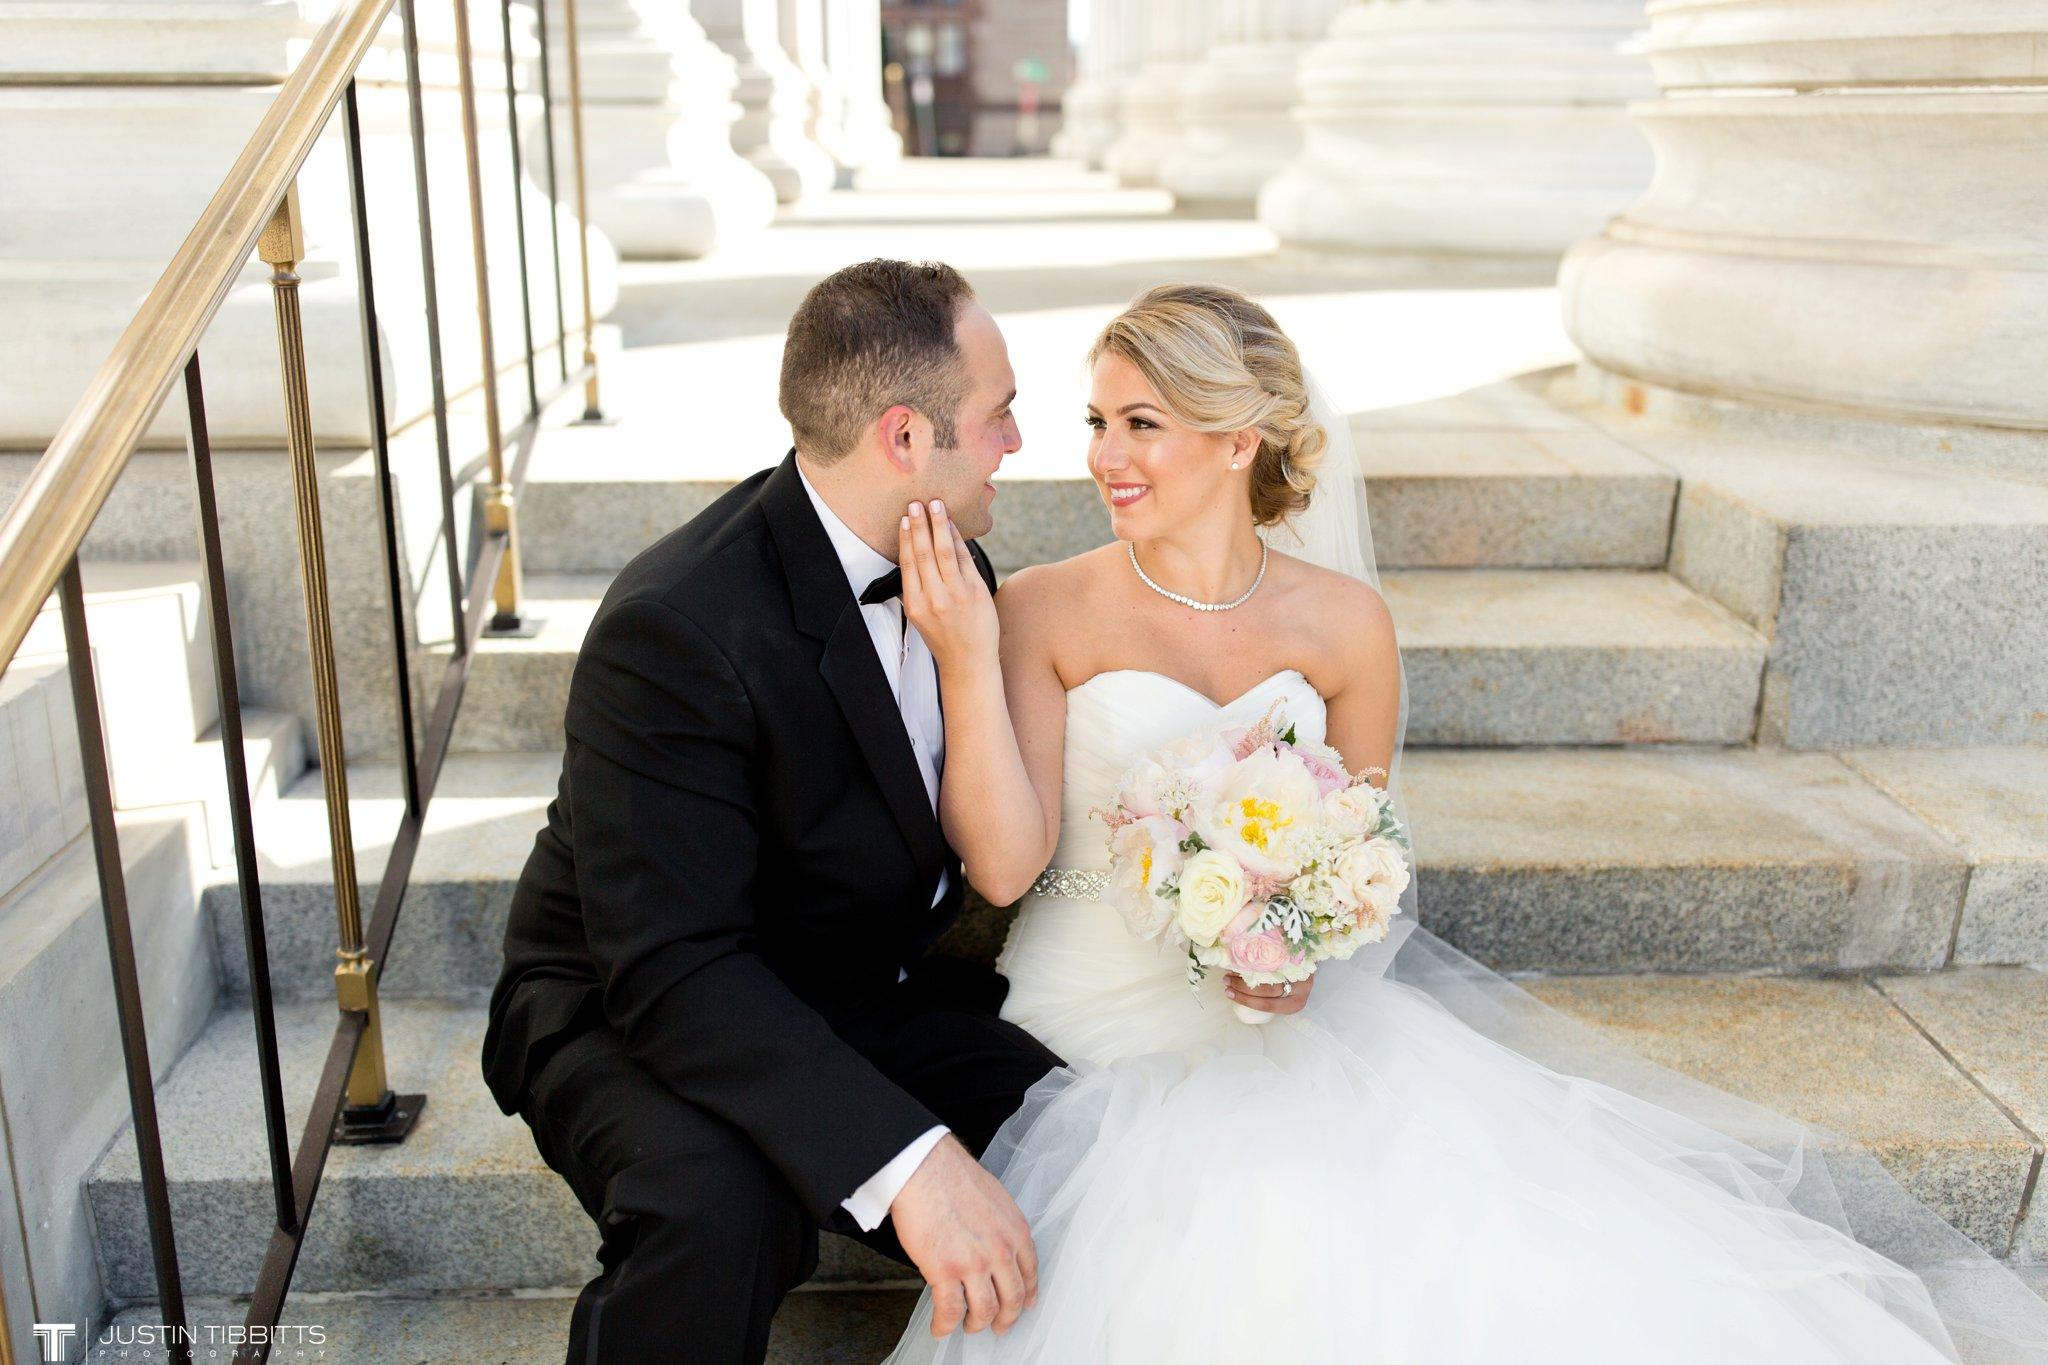 state-room-wedding-photos-with-amanda-and-nick_0122